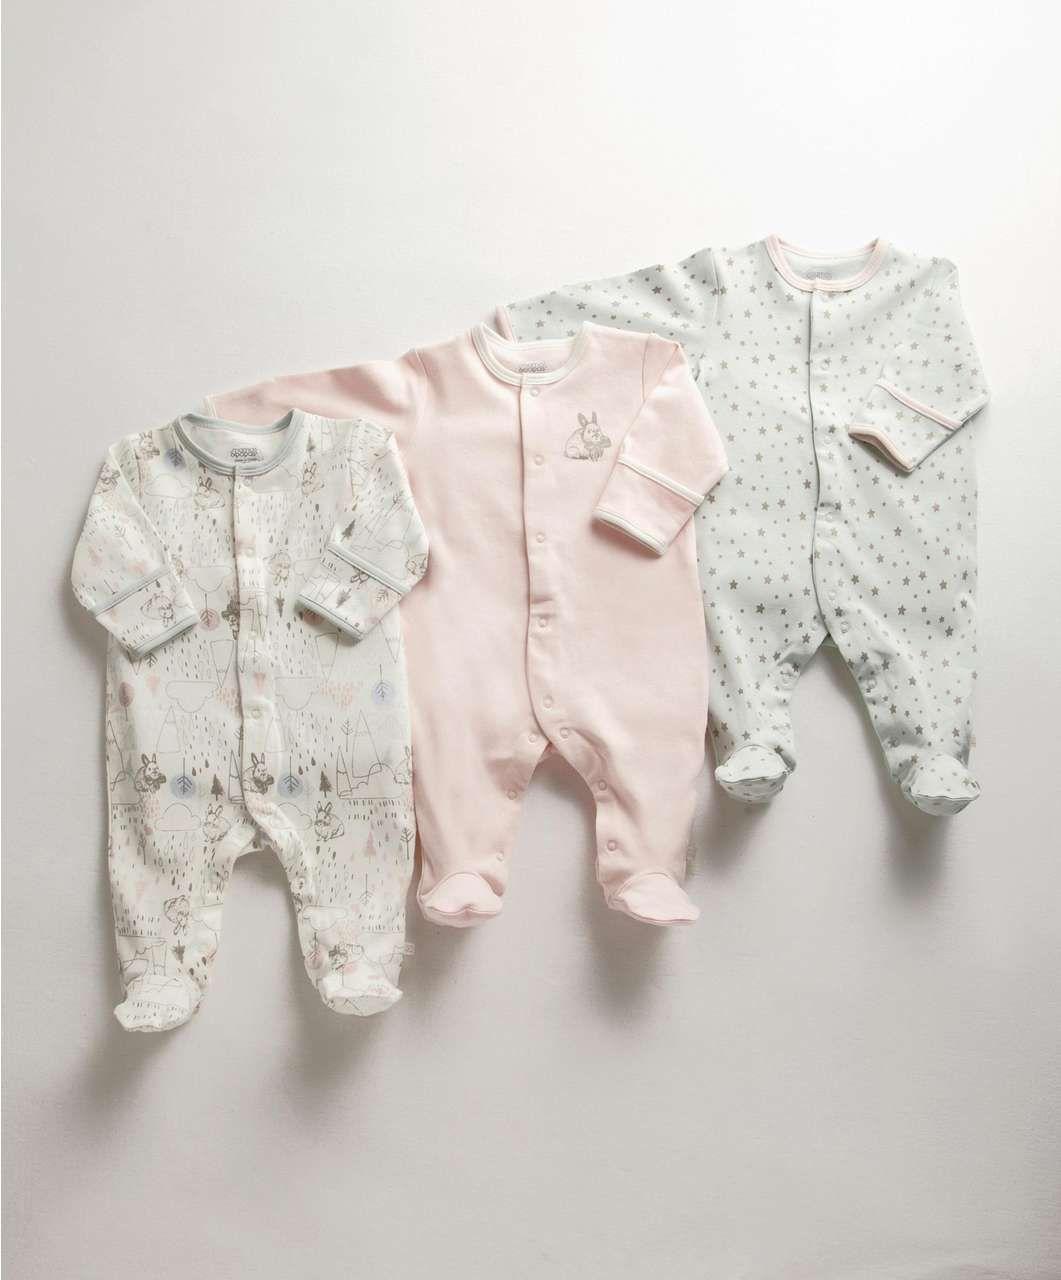 Mamas /& Papas Baby Girls Shortie Dunagree /& Bodysuit Clothing Set